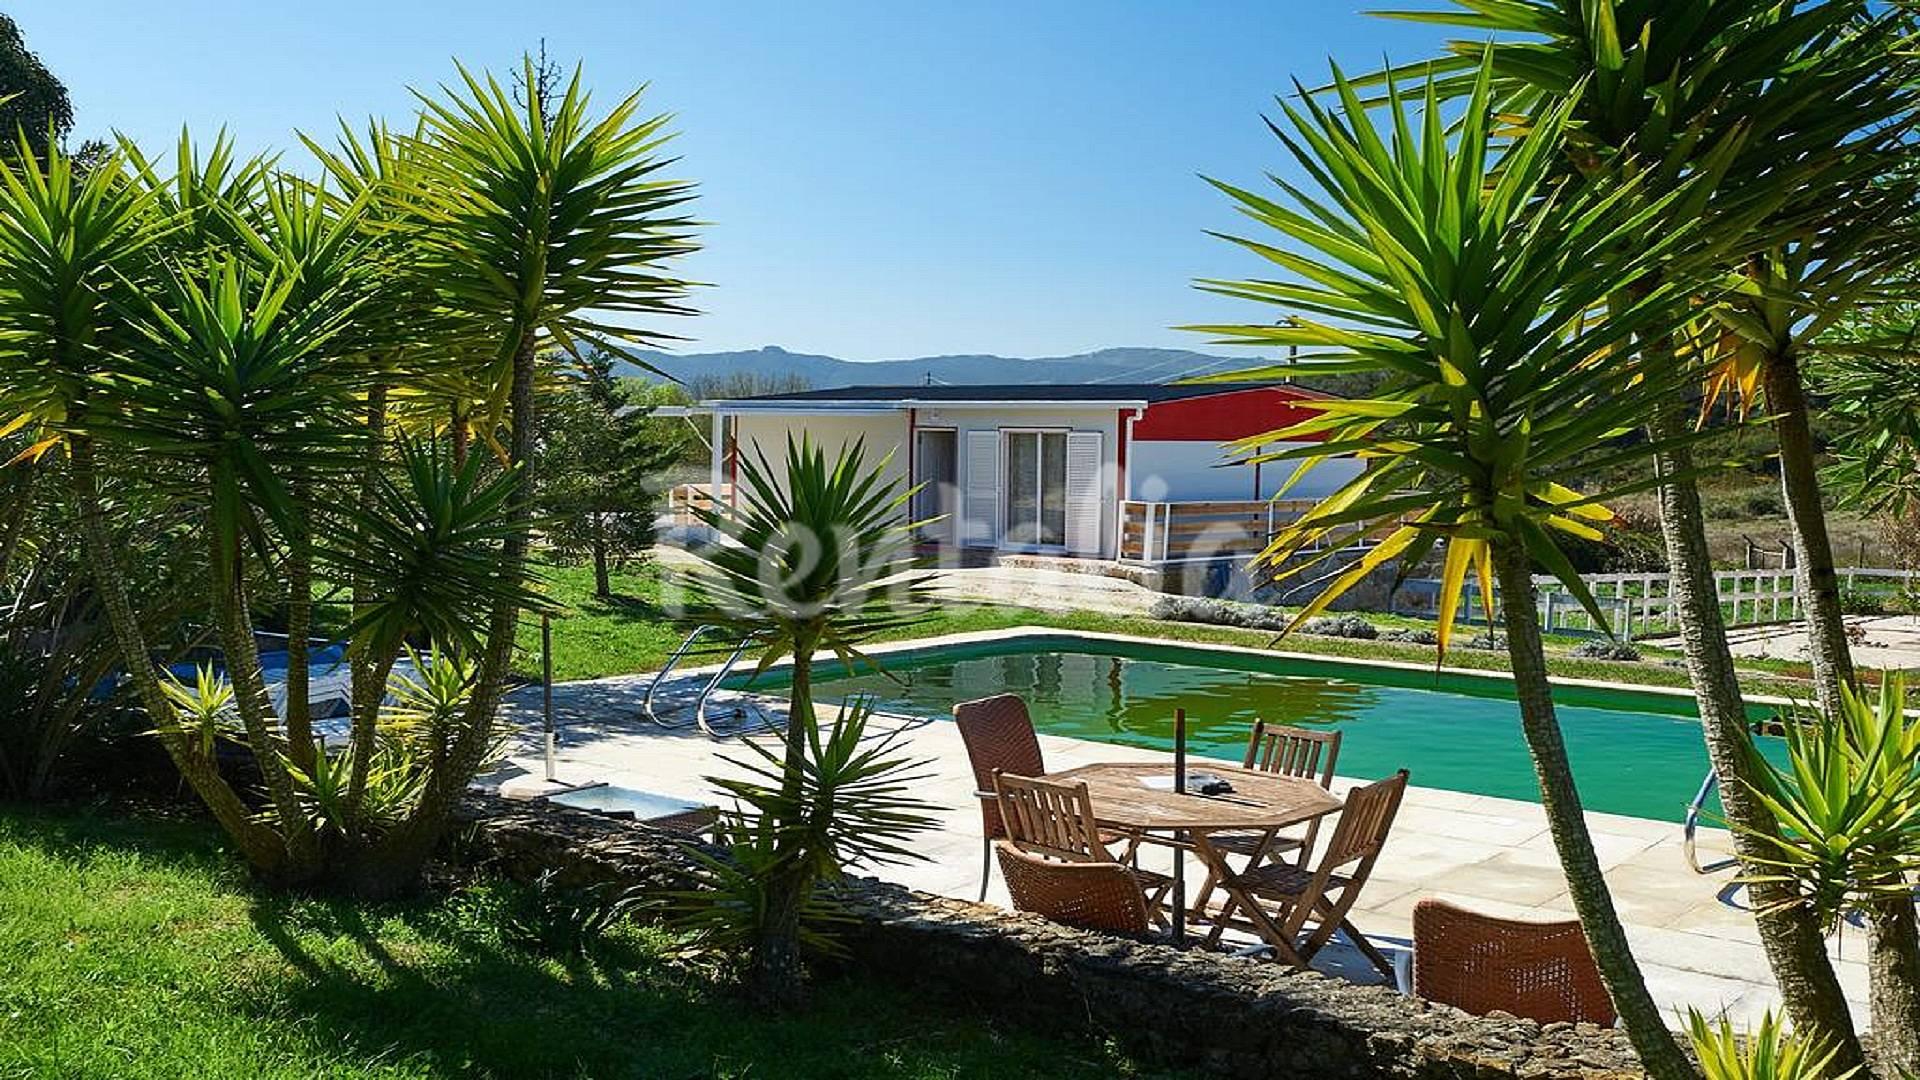 Casa para 4 5 personas con piscina terrugem elvas for Piscina elvas